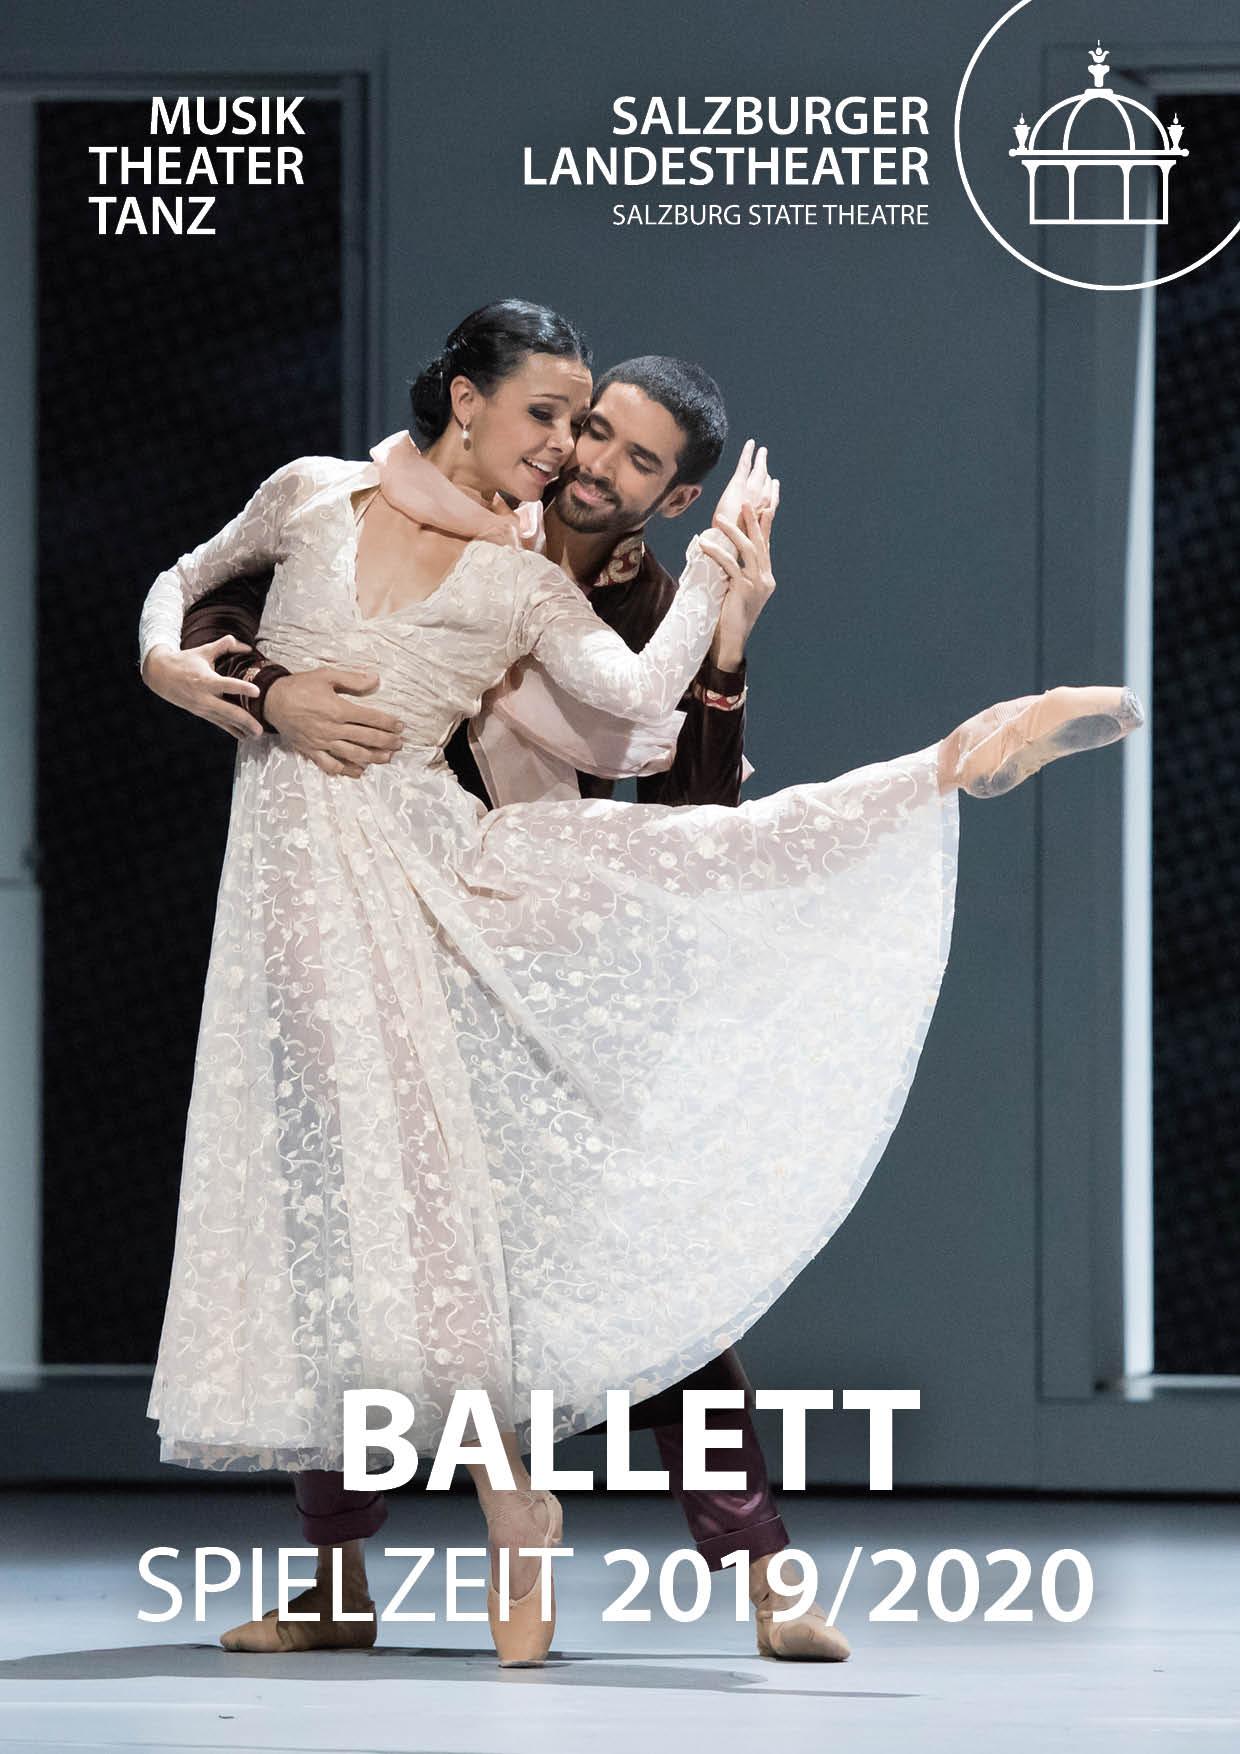 Ballett 2019/2020